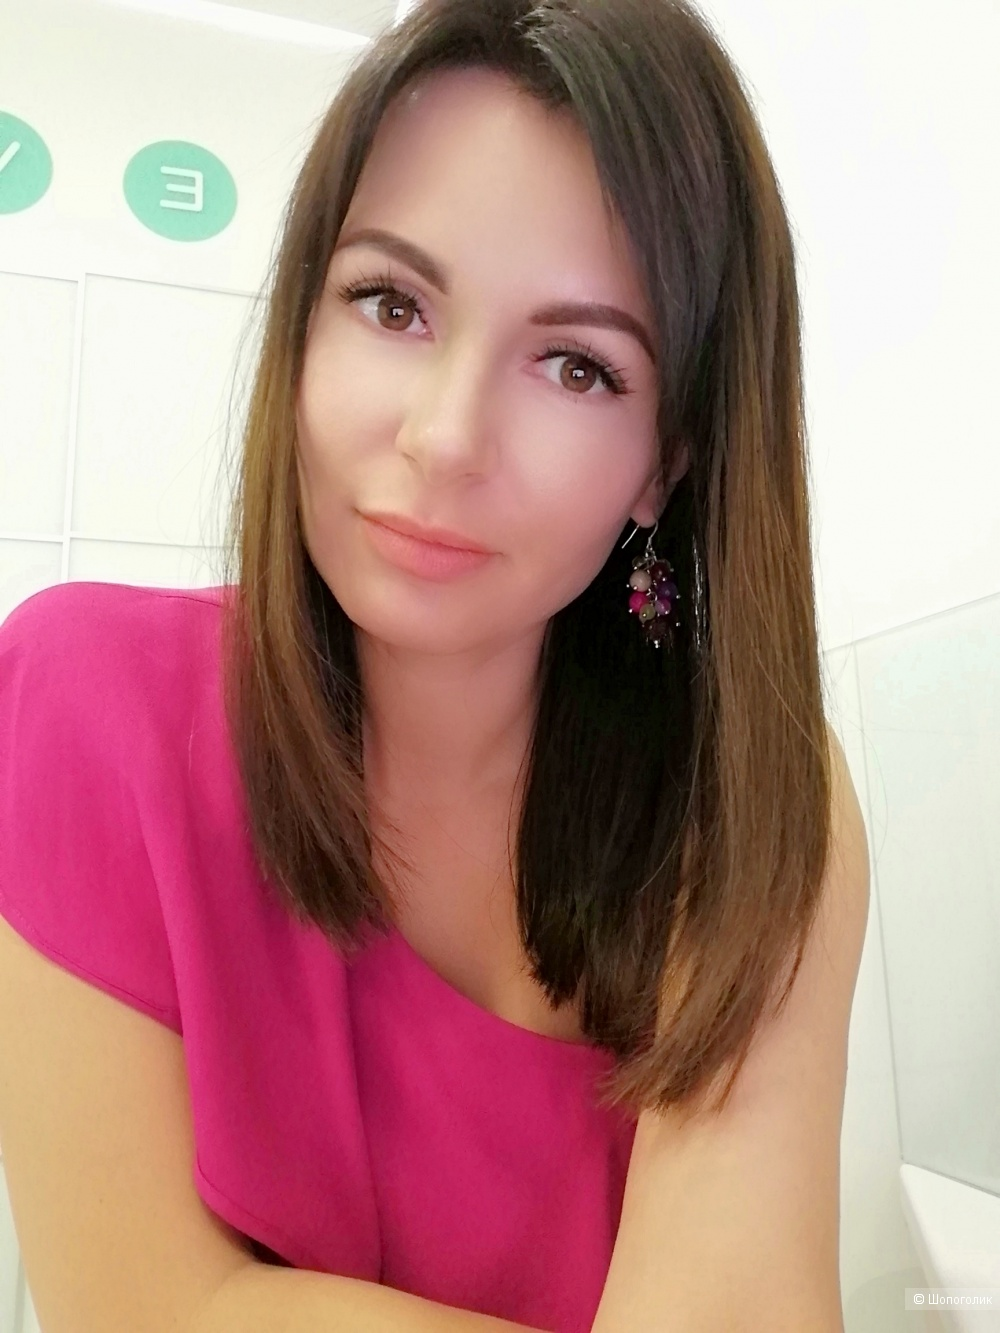 Серьги от Anna Slavutina